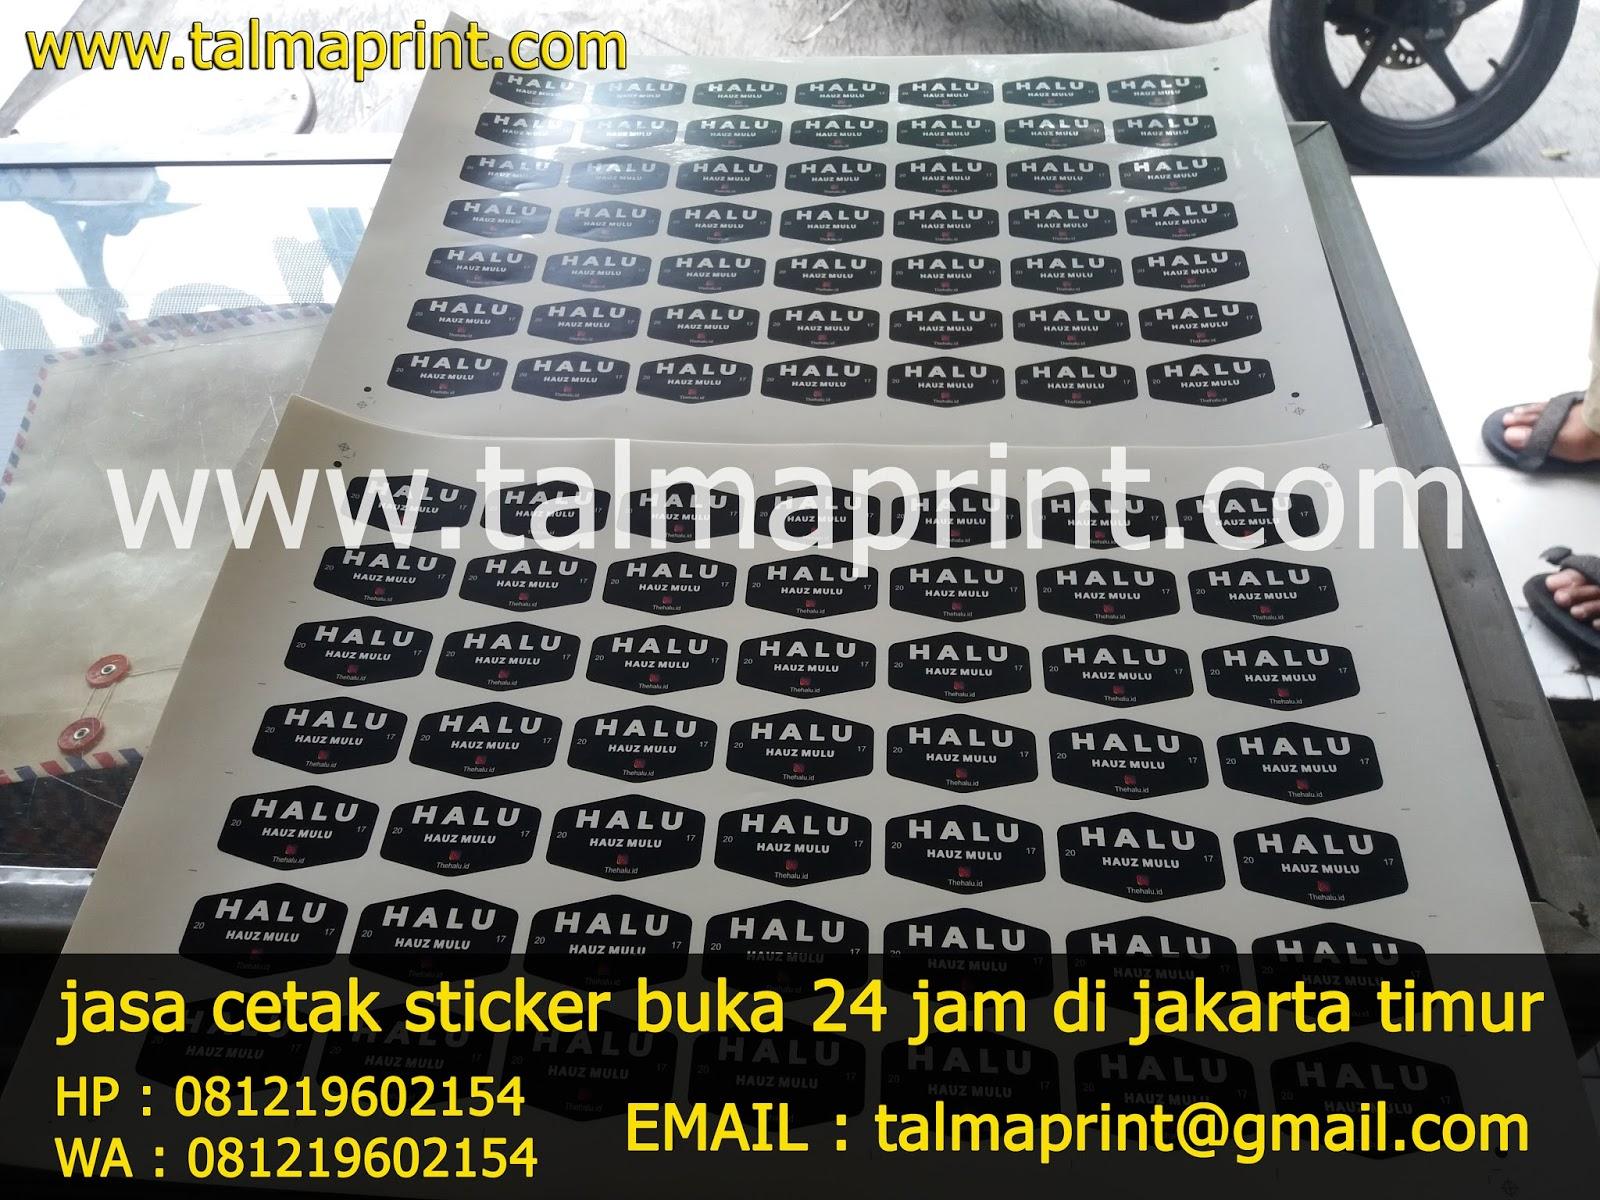 Tempat Cetak Stiker Di Jakarta Layanan 24 Jam Talmaprint Copy Contoh Hasil Pekerjaan Kami